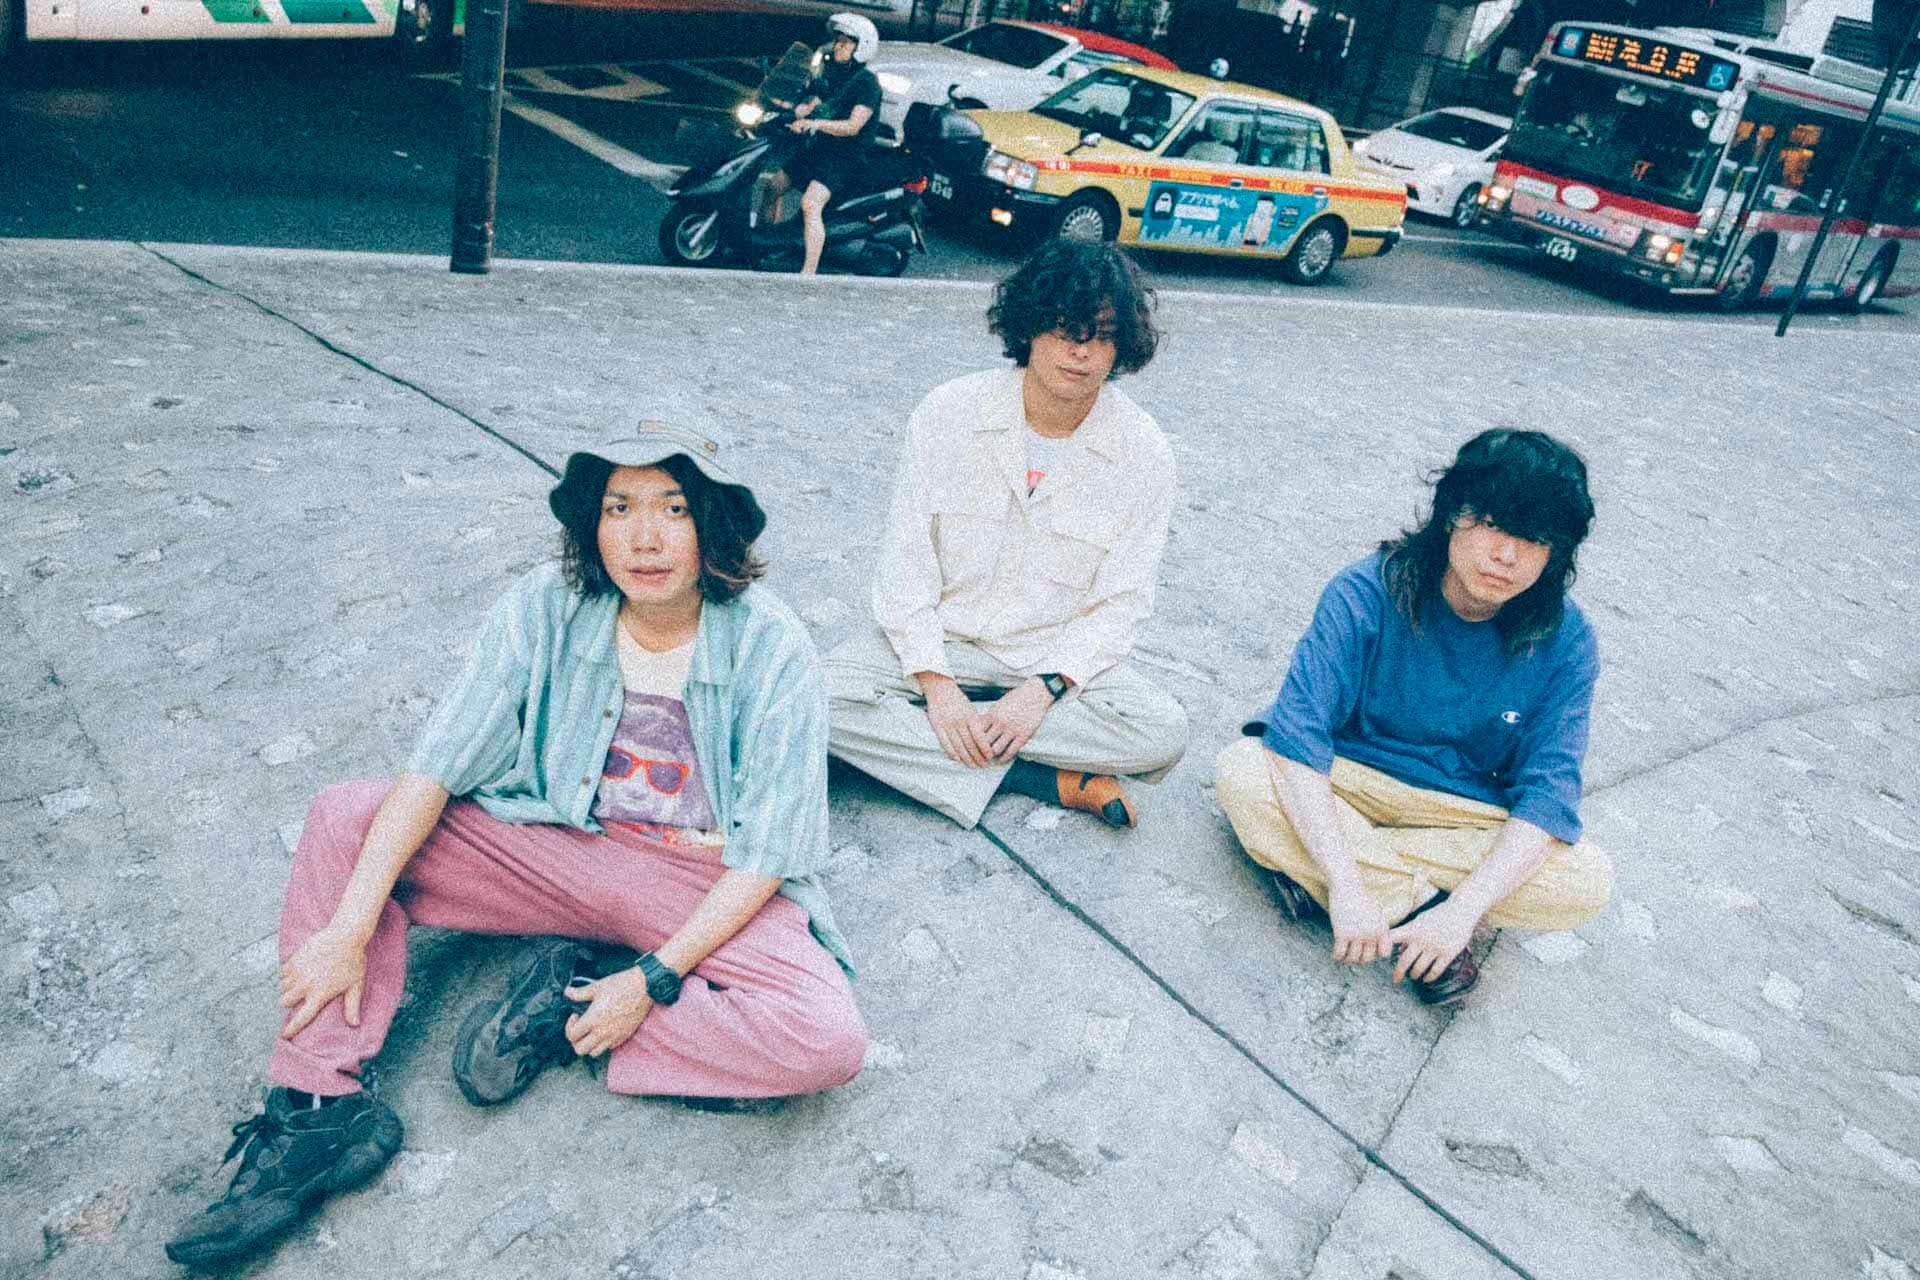 Tempalay × ドミコ × MONO NO AWARE「中国巡演」鼎談|盟友となった中国ツアーを振り返る interview1007_chinatour-0680